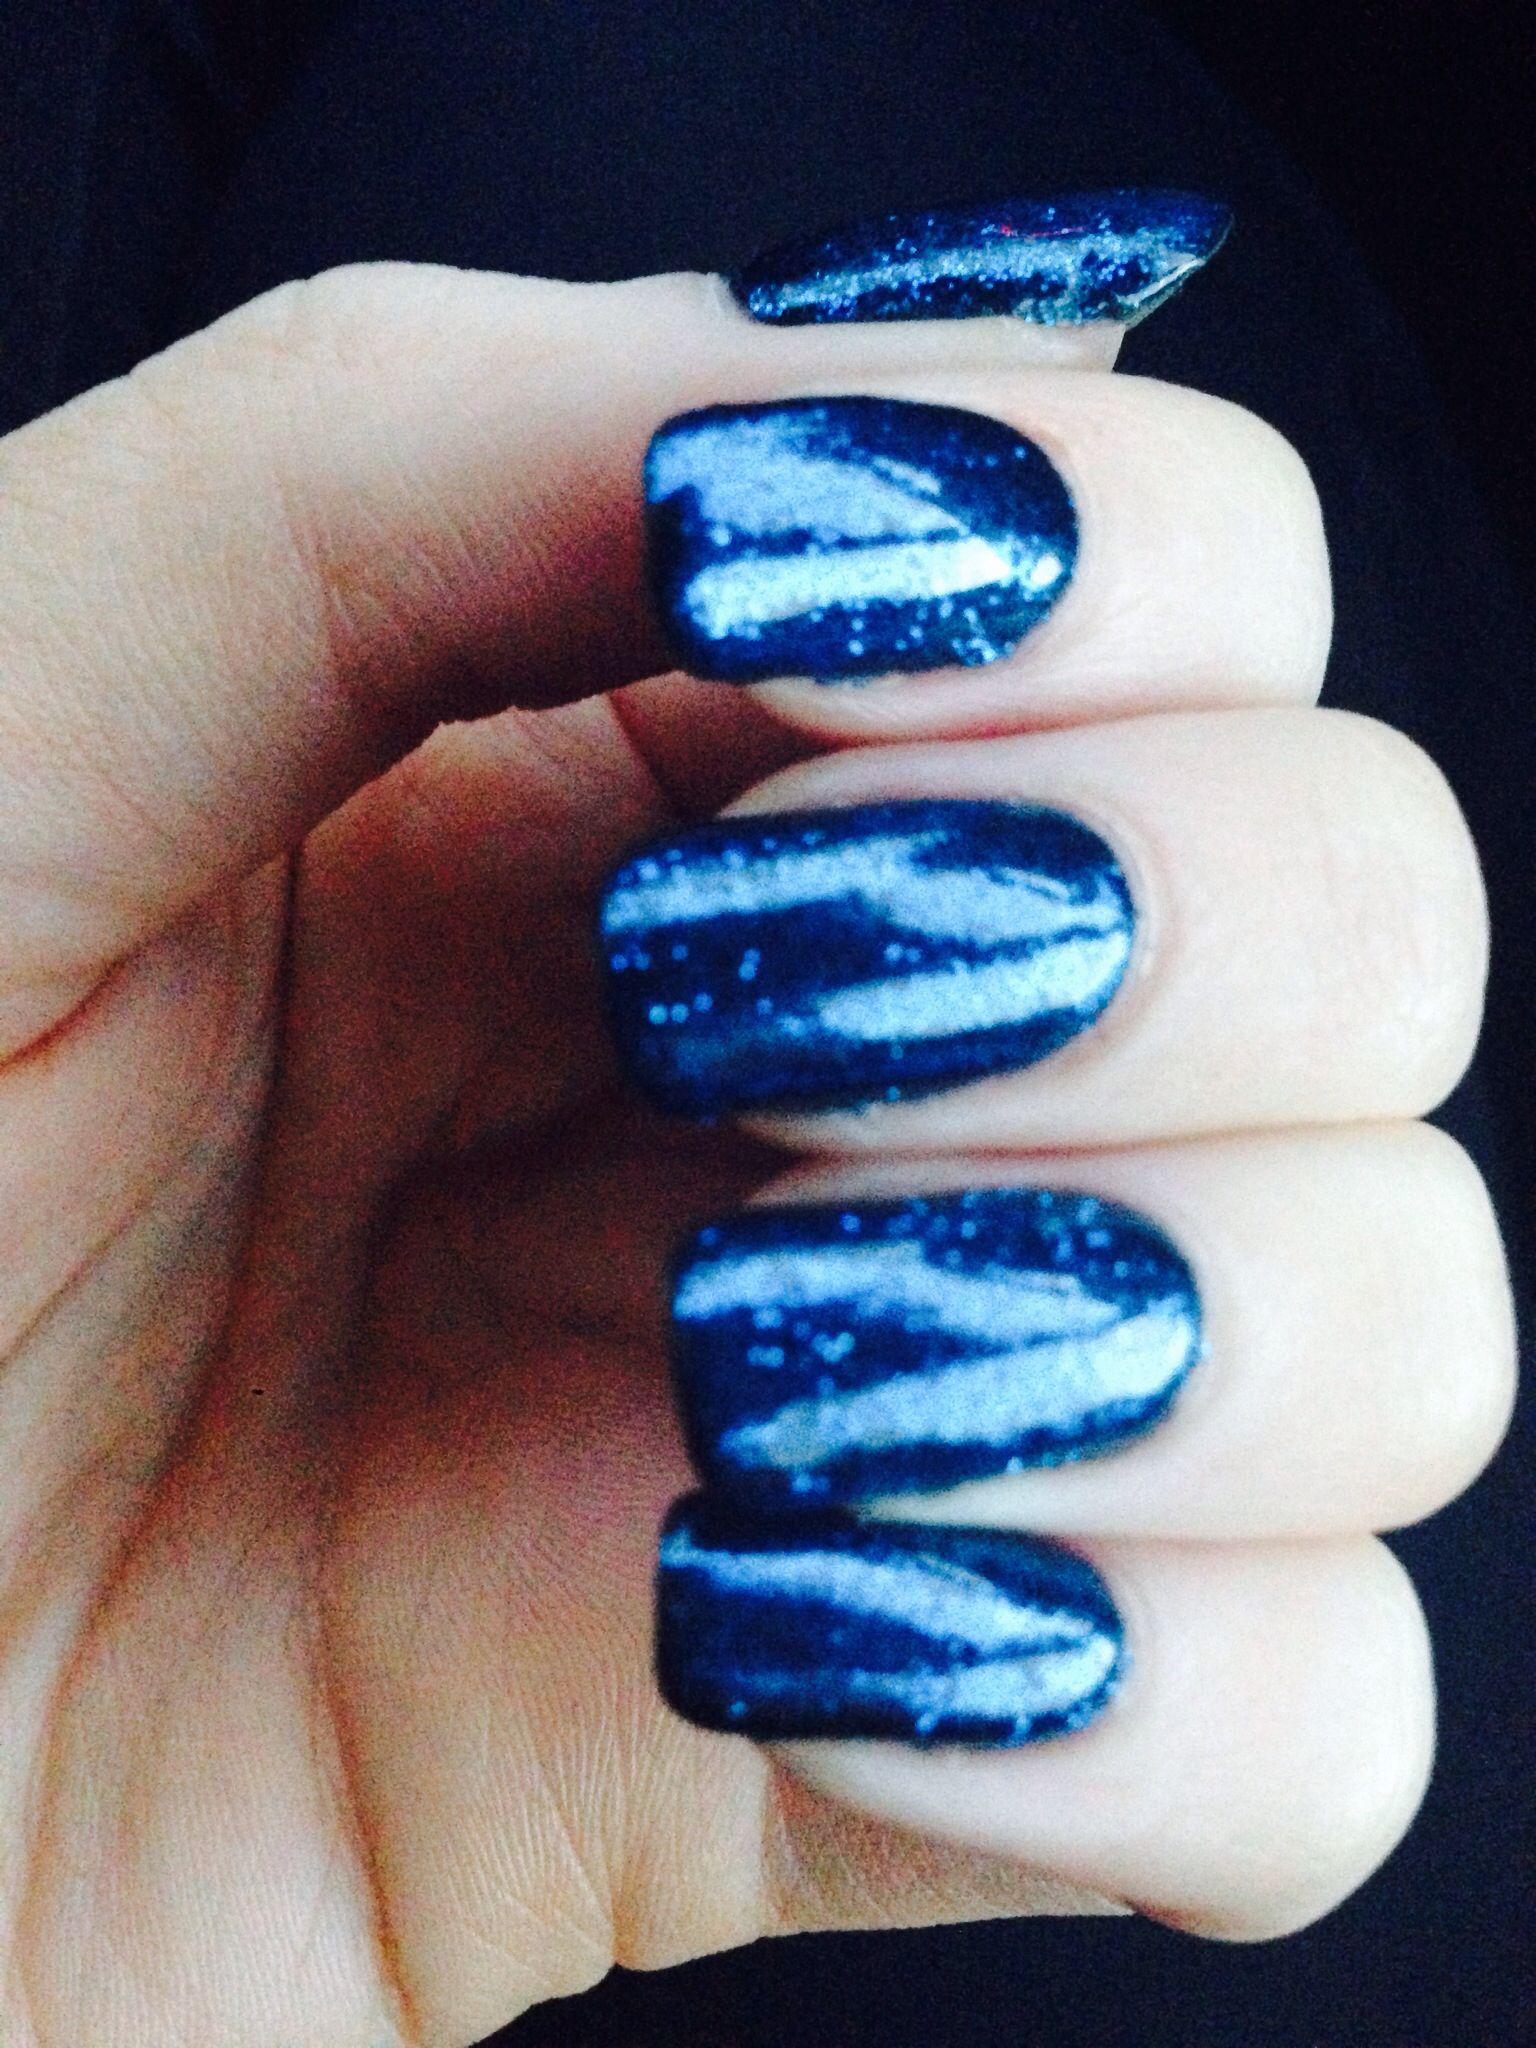 Sparkly navy blue shellac nails! Midnight swim & inky blue glitter ...